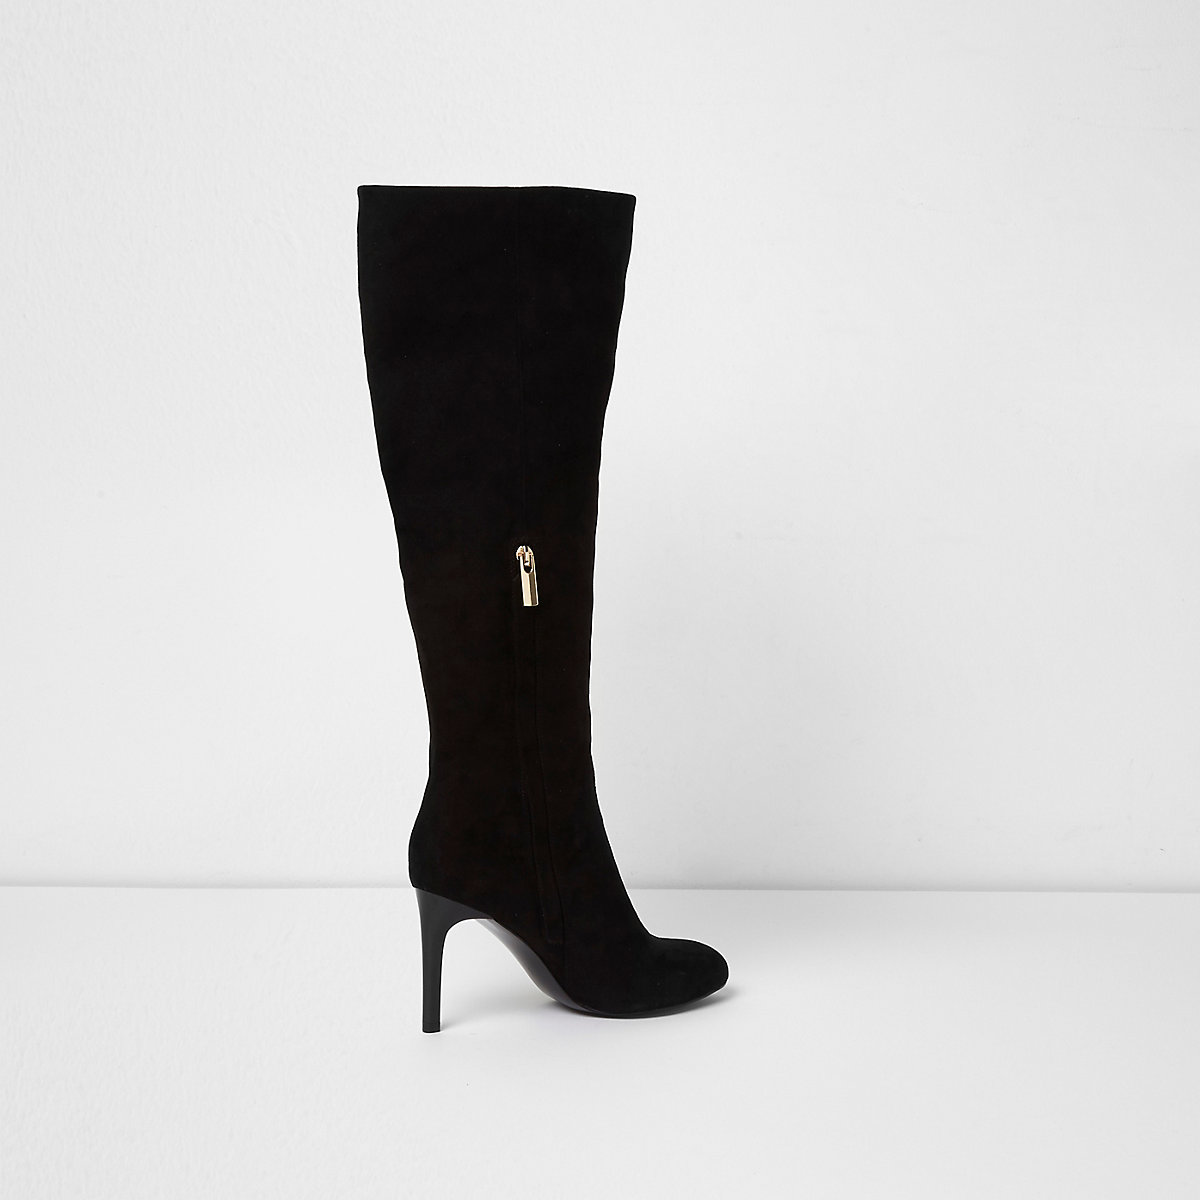 ... Zwarte kniehoge laarzen met stilettohak ...